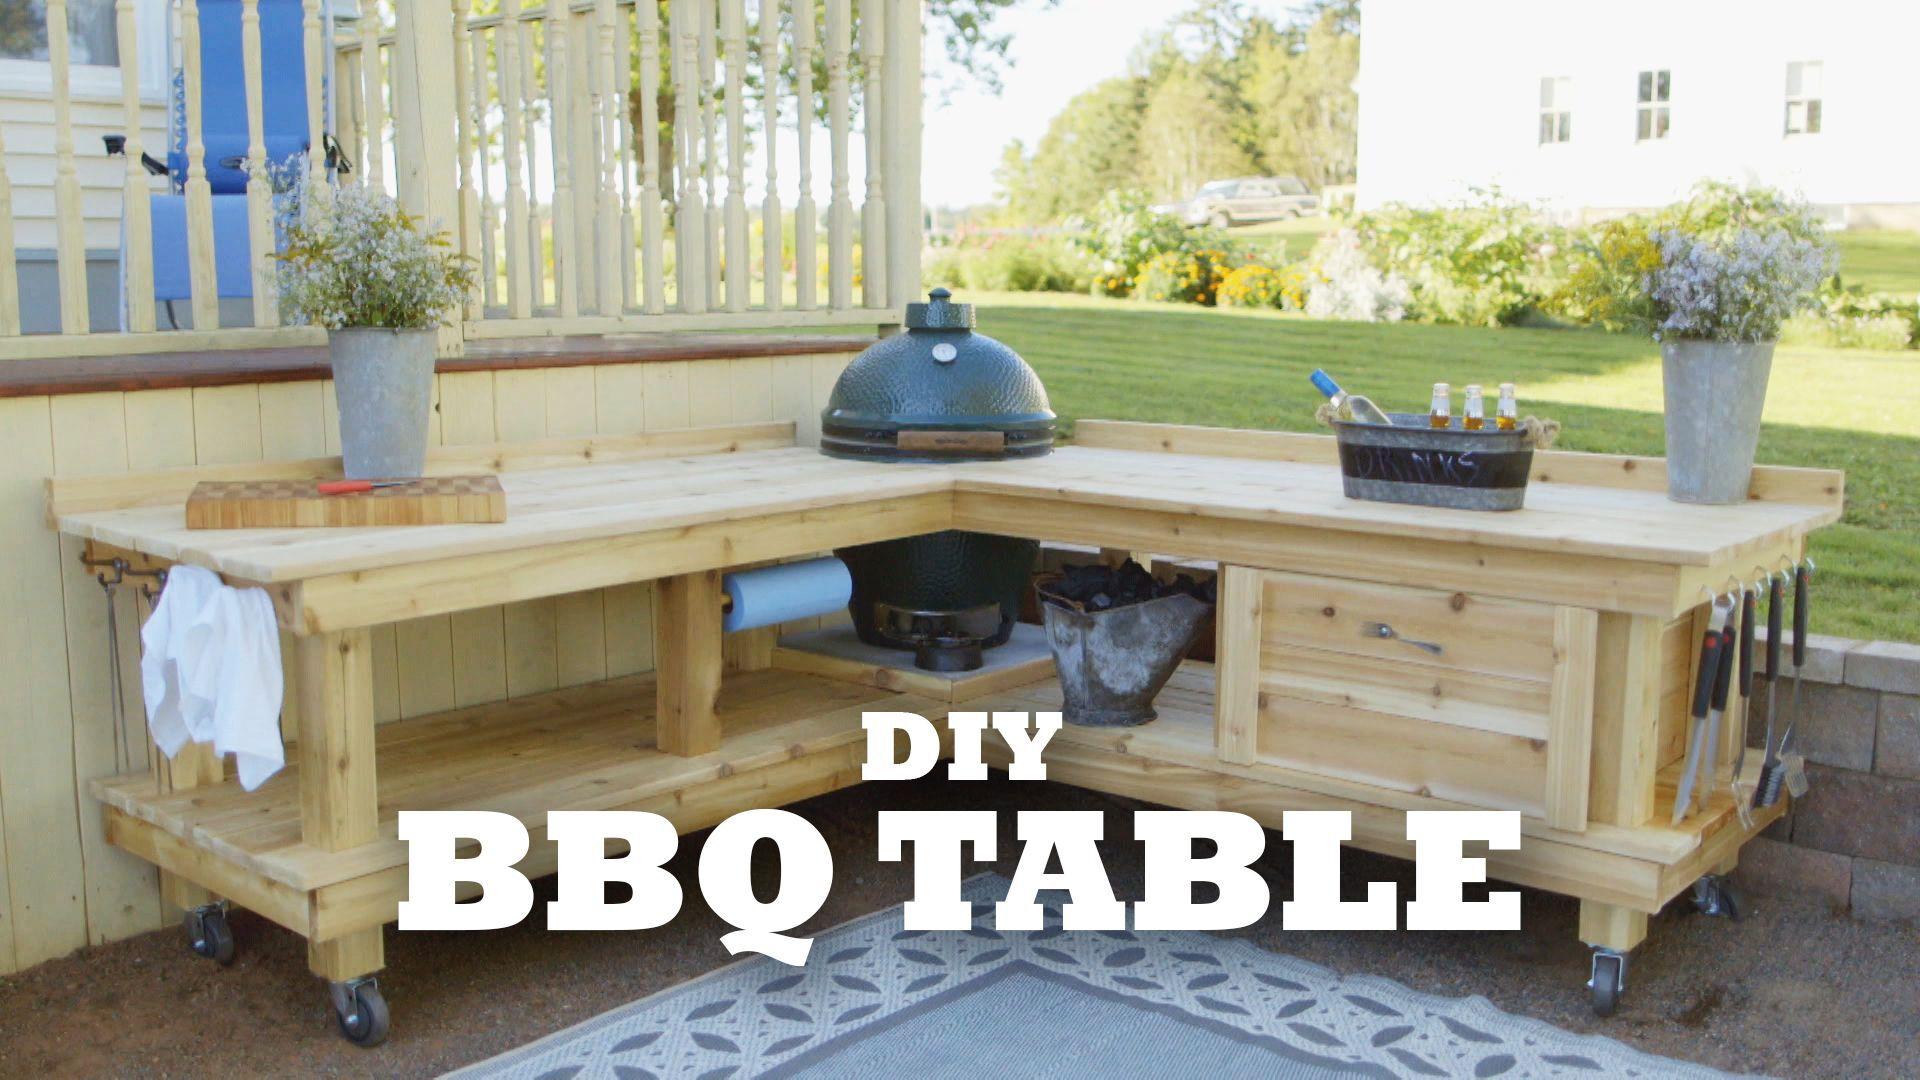 DIY backyard BBQ table   Cottage Life on Diy Bbq Patio id=42825